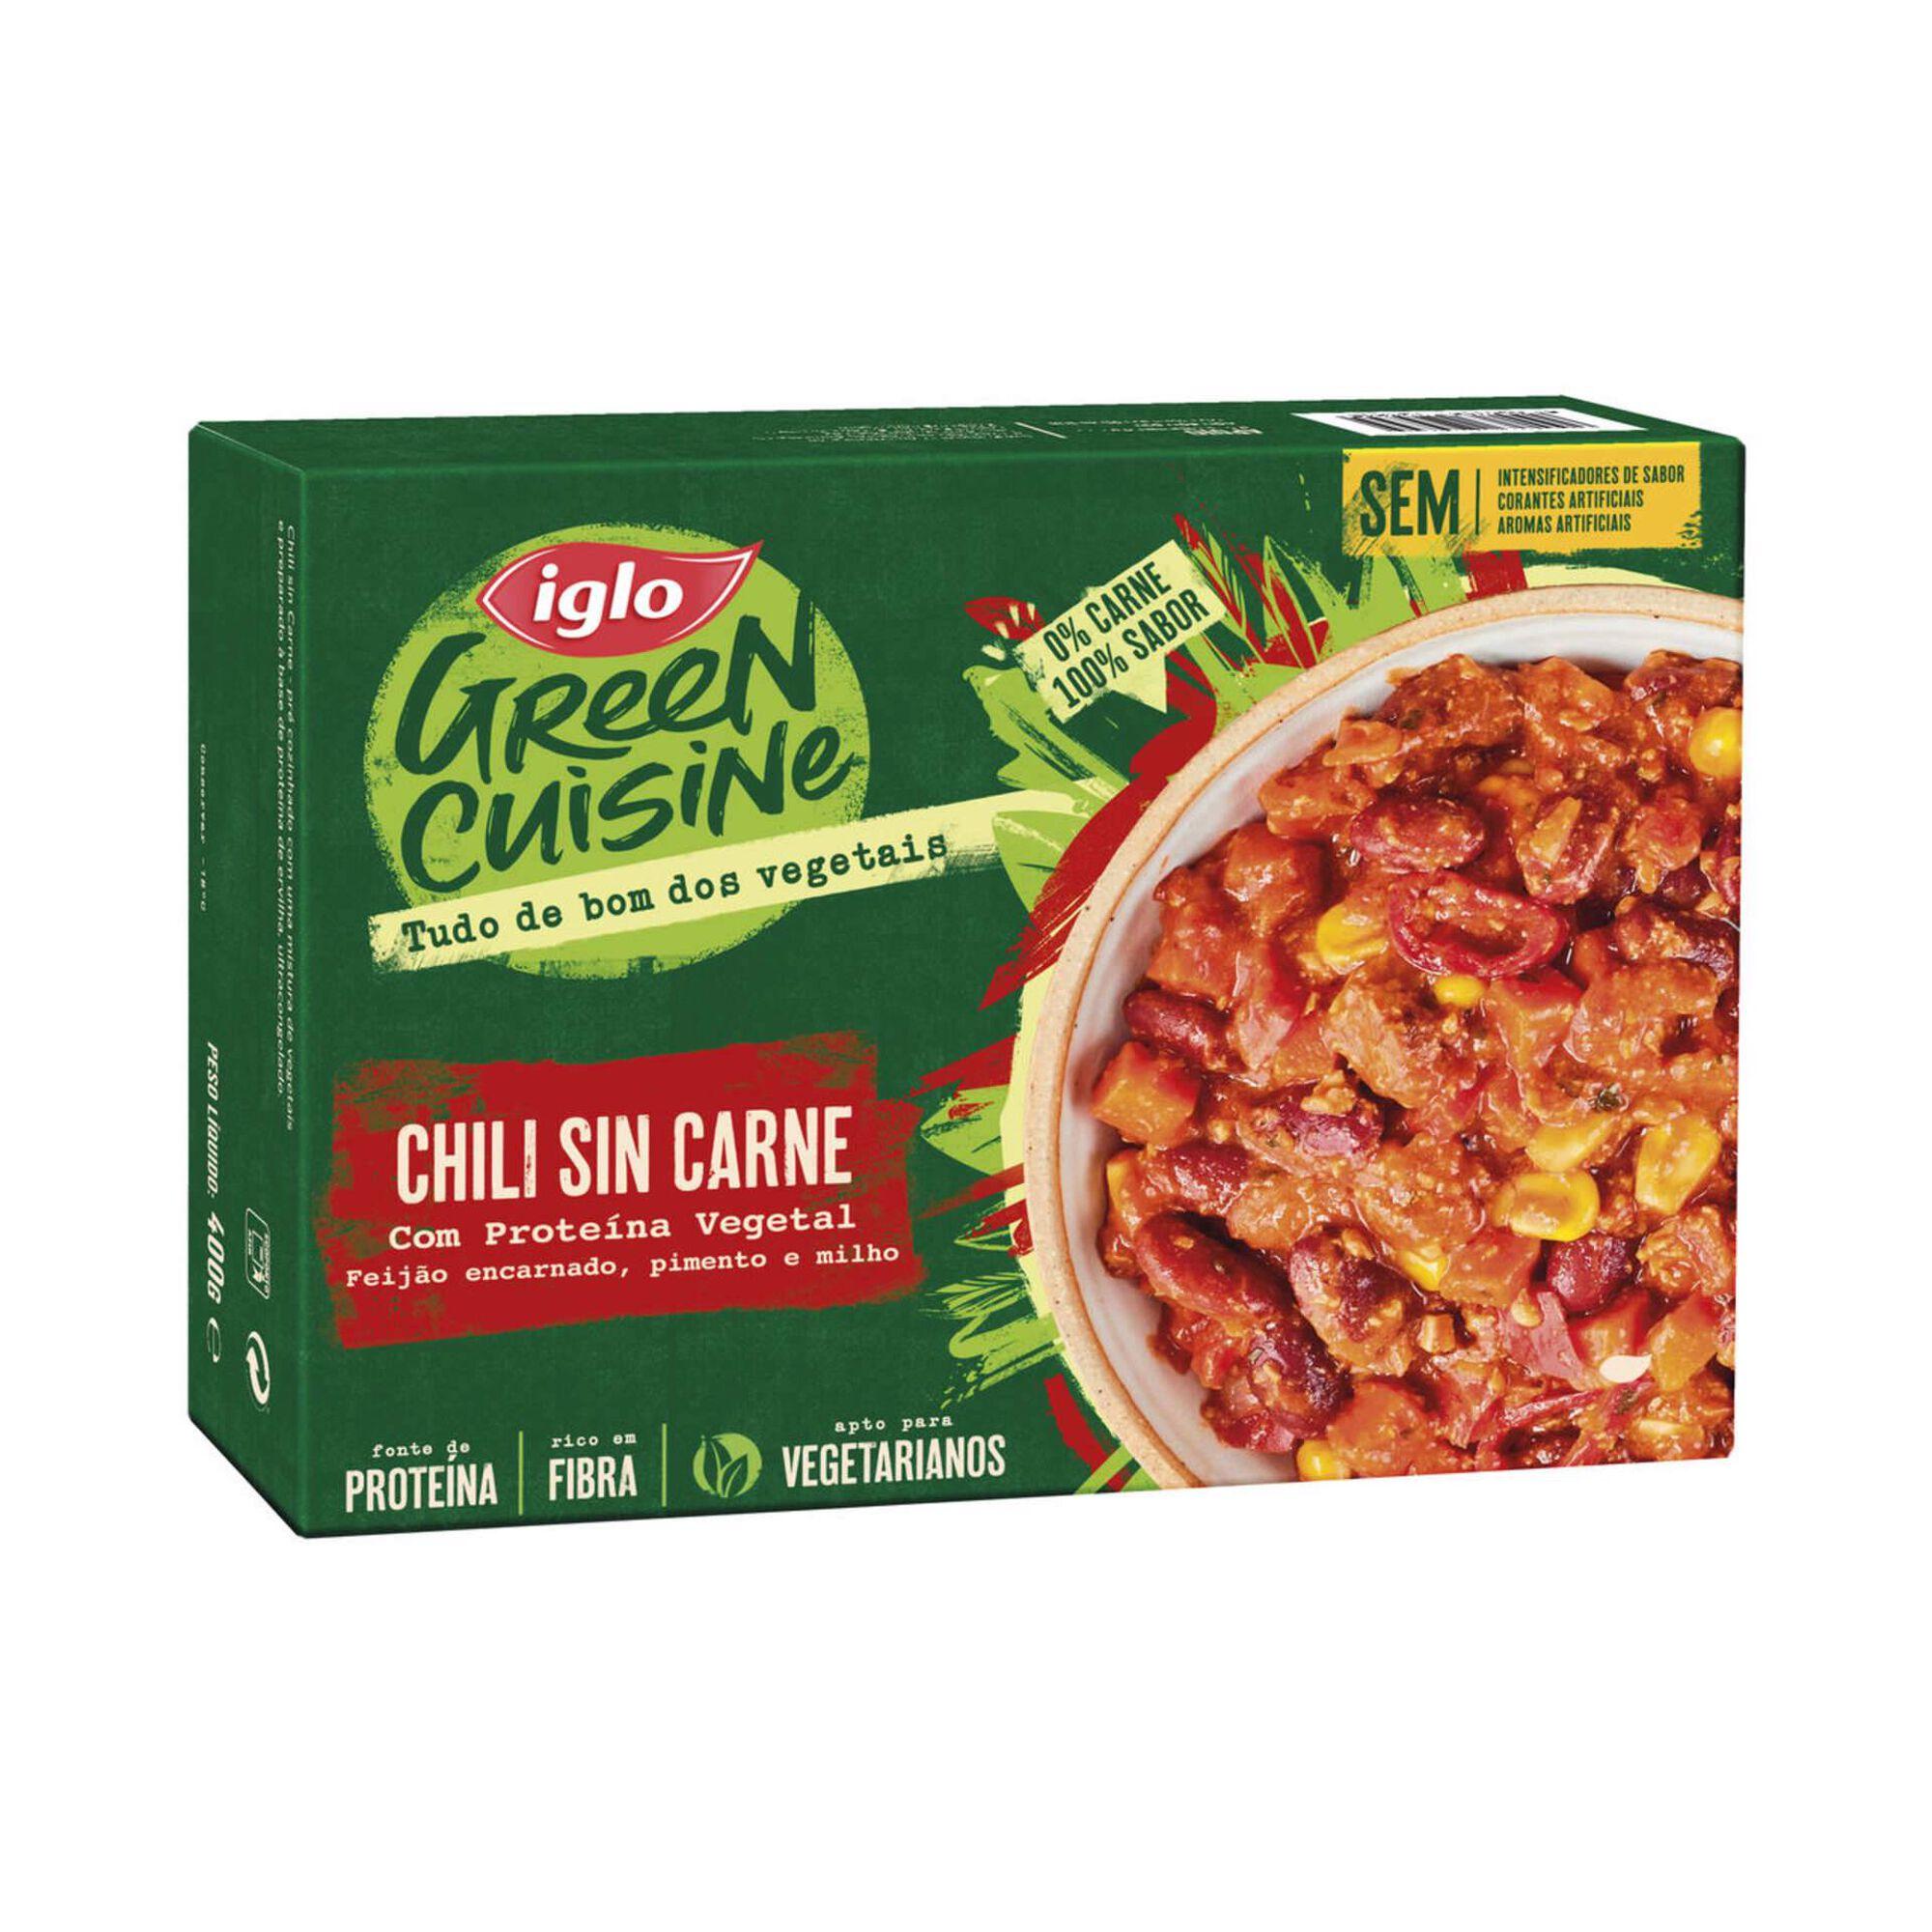 Chili Sin Carne com Proteína Vegetal